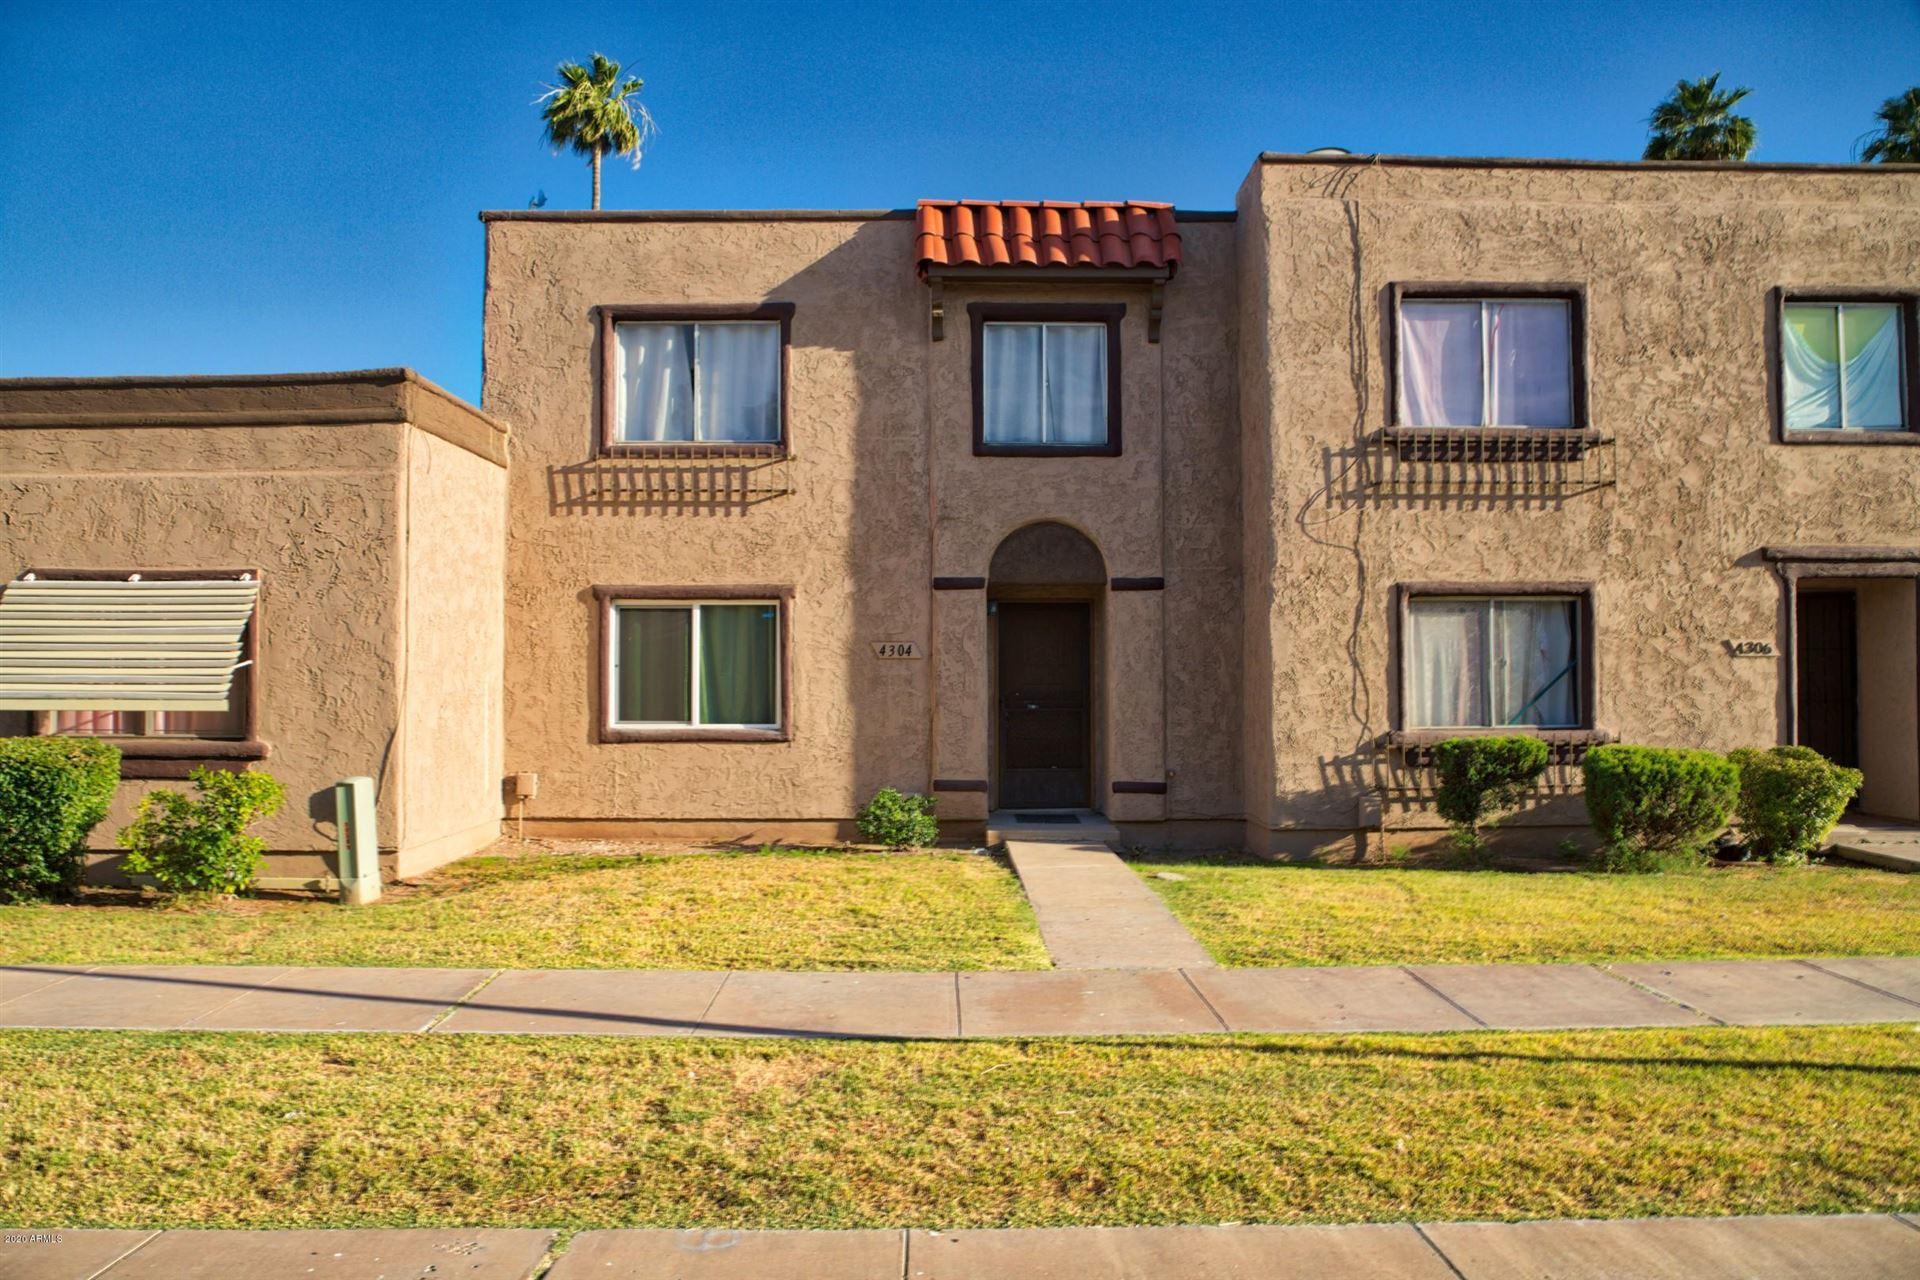 4304 W SOLANO Drive #S, Glendale, AZ 85301 - MLS#: 6082149